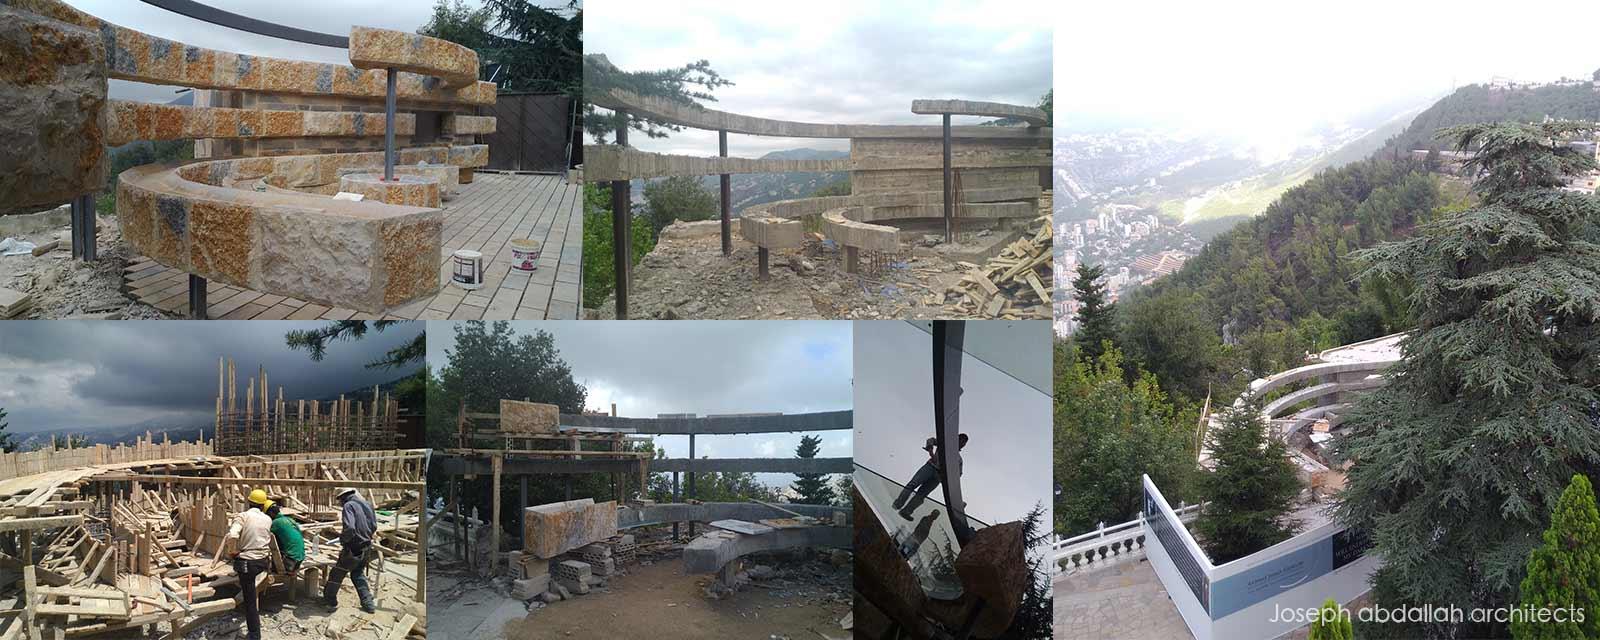 harissa-notre-dame-of-lebanon-shrink-architecture-joseph-abdallah-architects-6